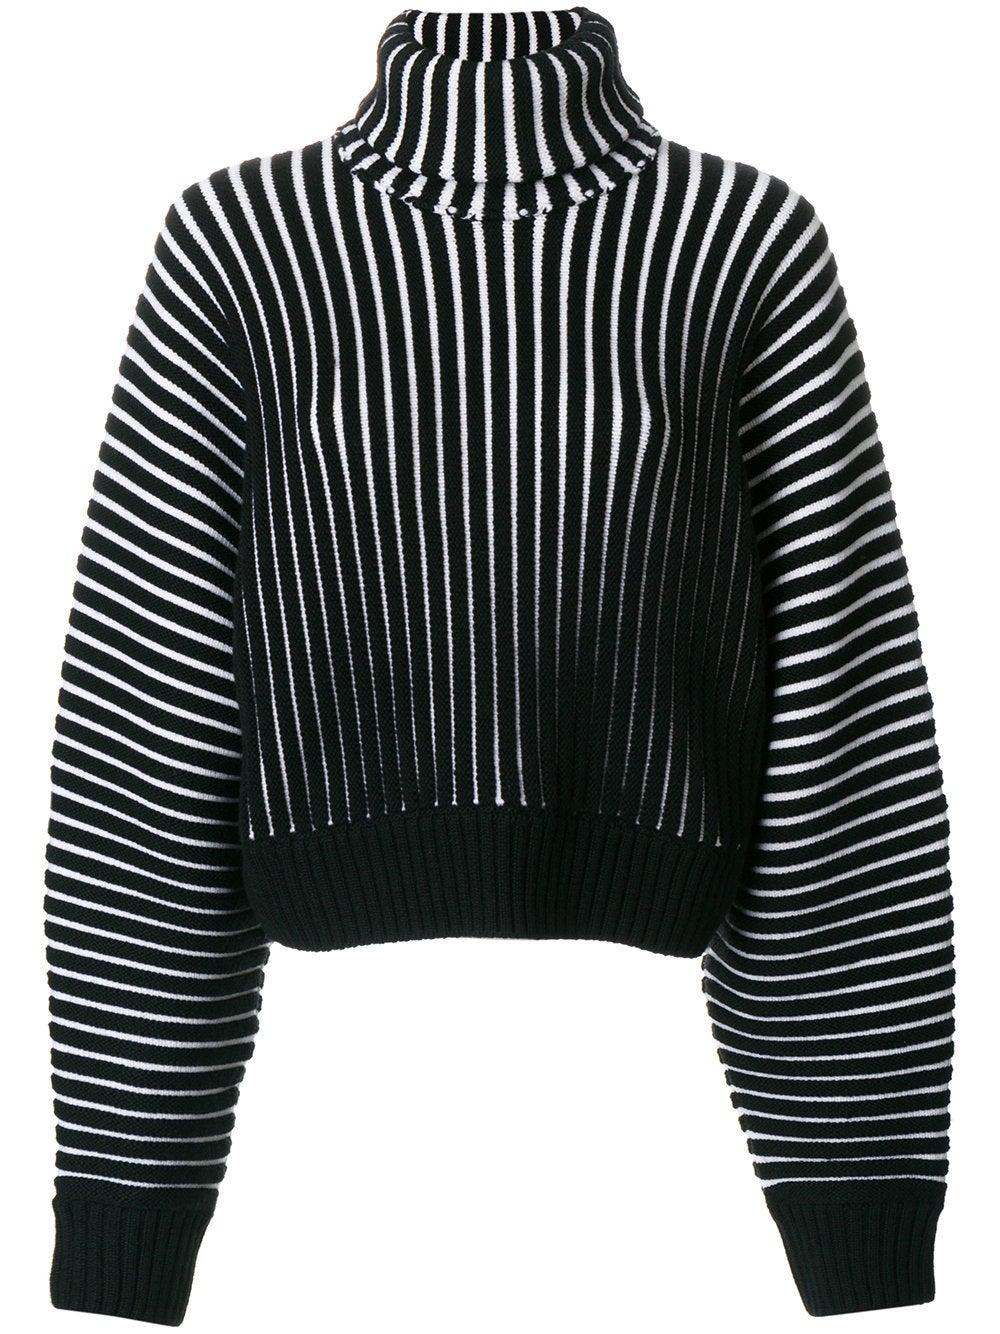 e03d79b24f Zara + Color Block Cable Knit Sweater